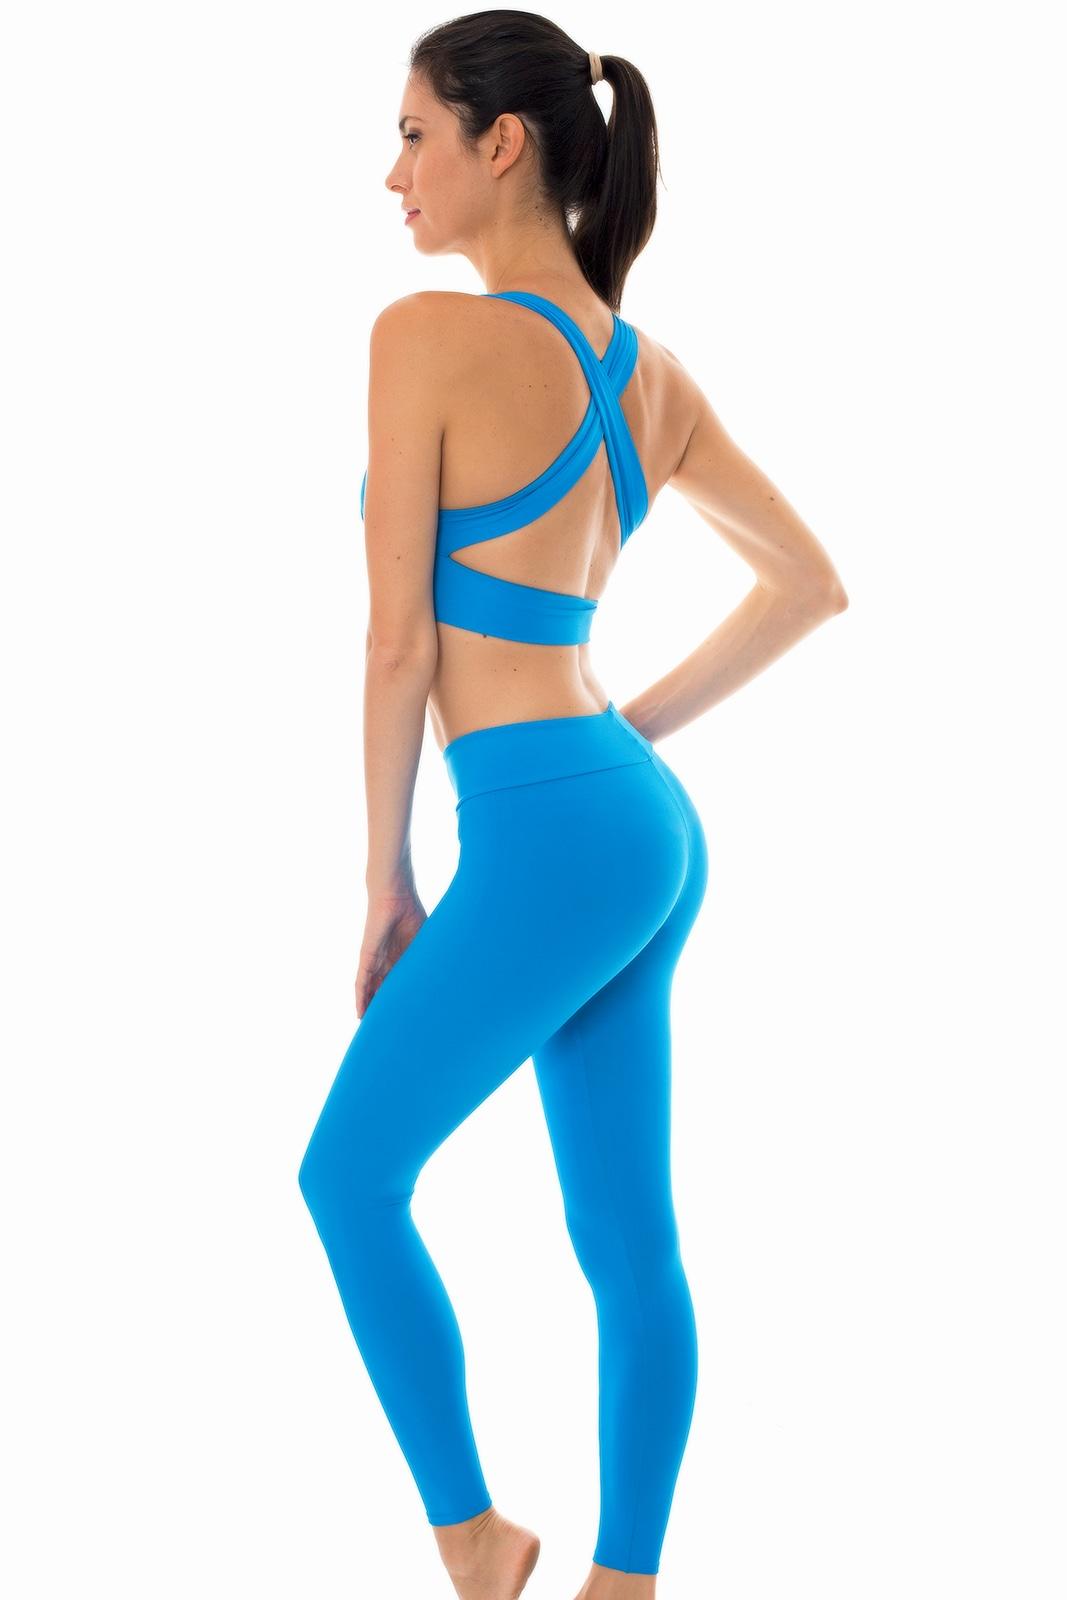 0bb40d1cf0bda Blue sports Bra And Workout Leggings Set - Nz Resort Fitness - Rio ...